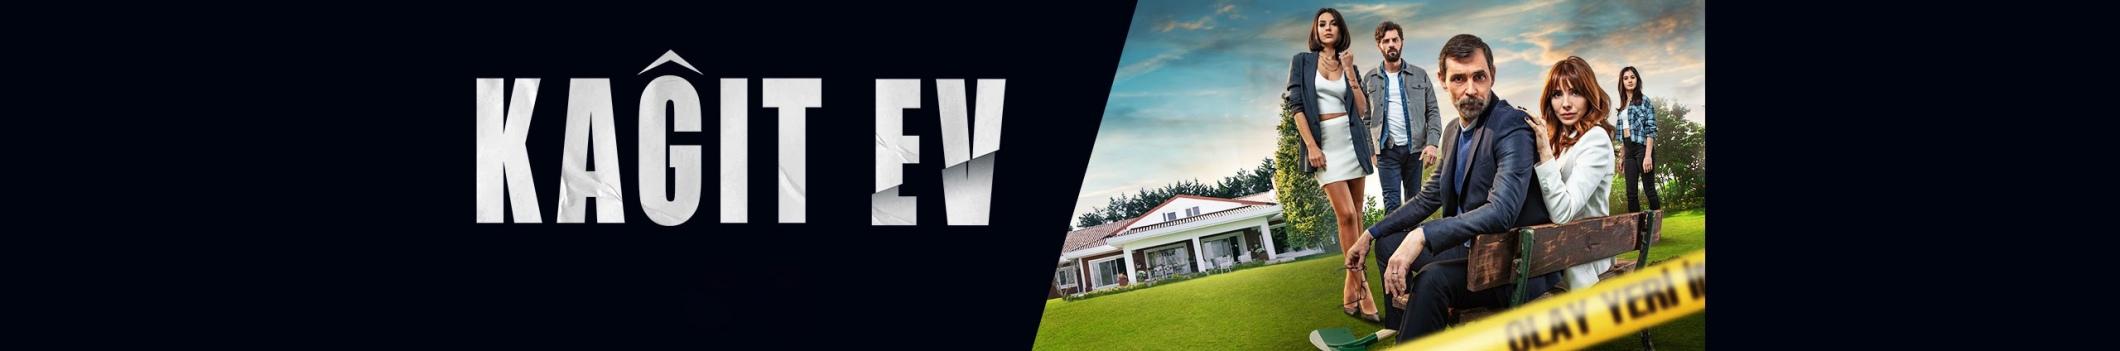 Kagit Ev Season 1 English subtitles | House of Lies